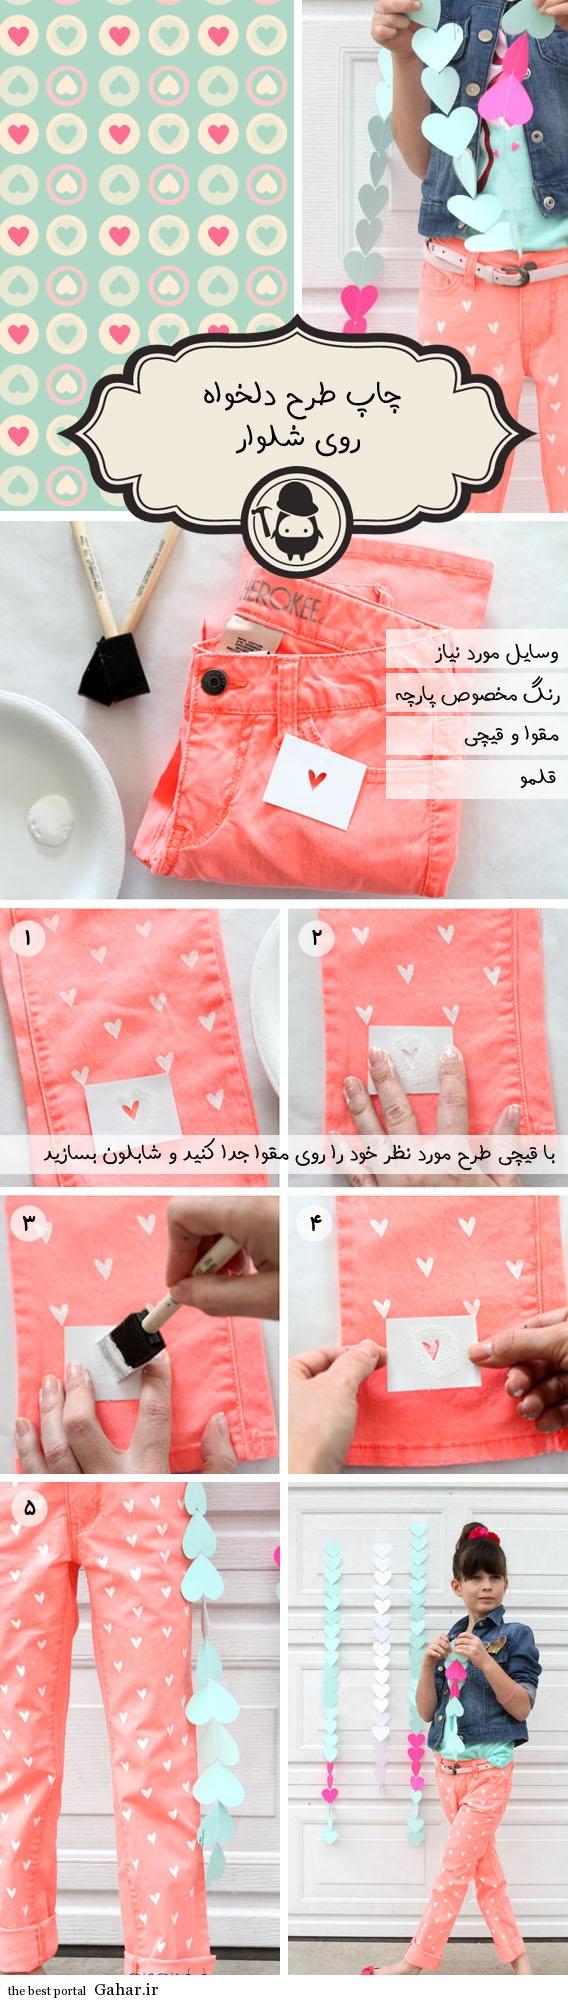 heartprintpants copy آموزش چاپ عکس دلخواه بروی لباس